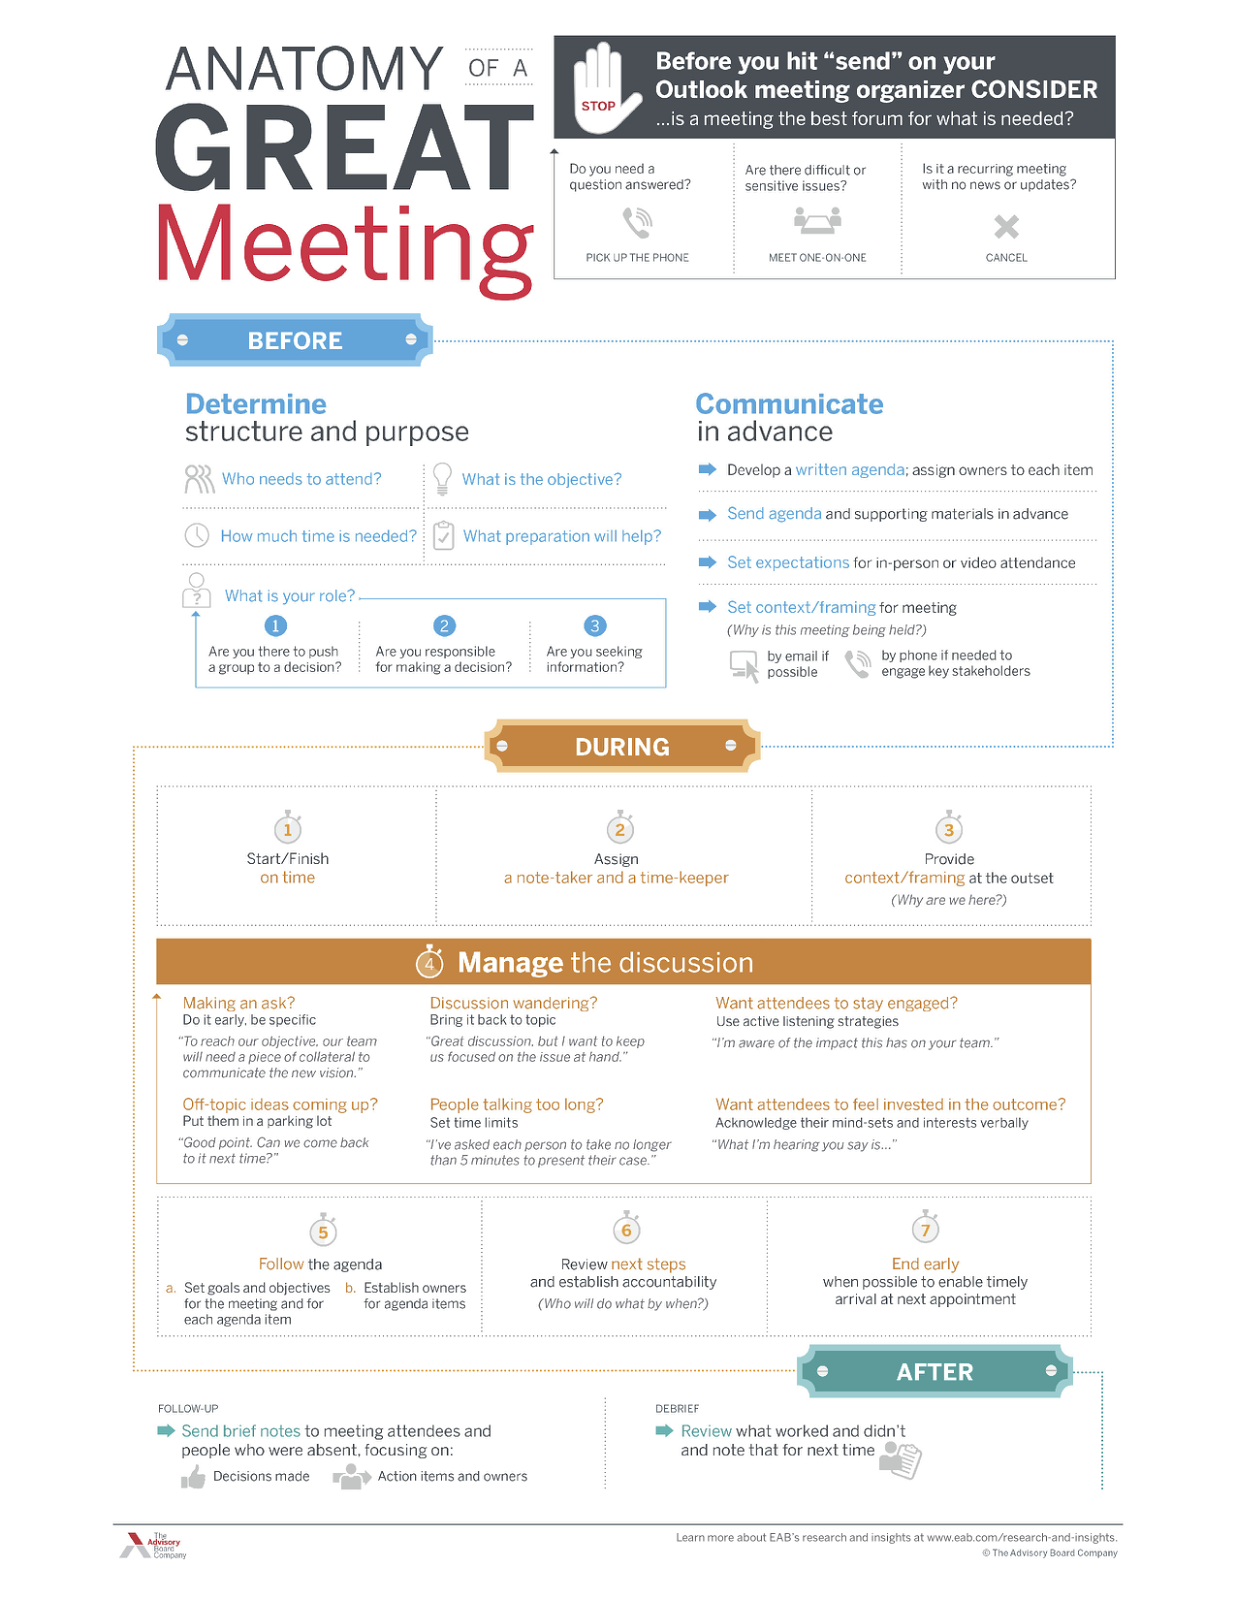 UVA Finance: Anatomy of a Great Meeting